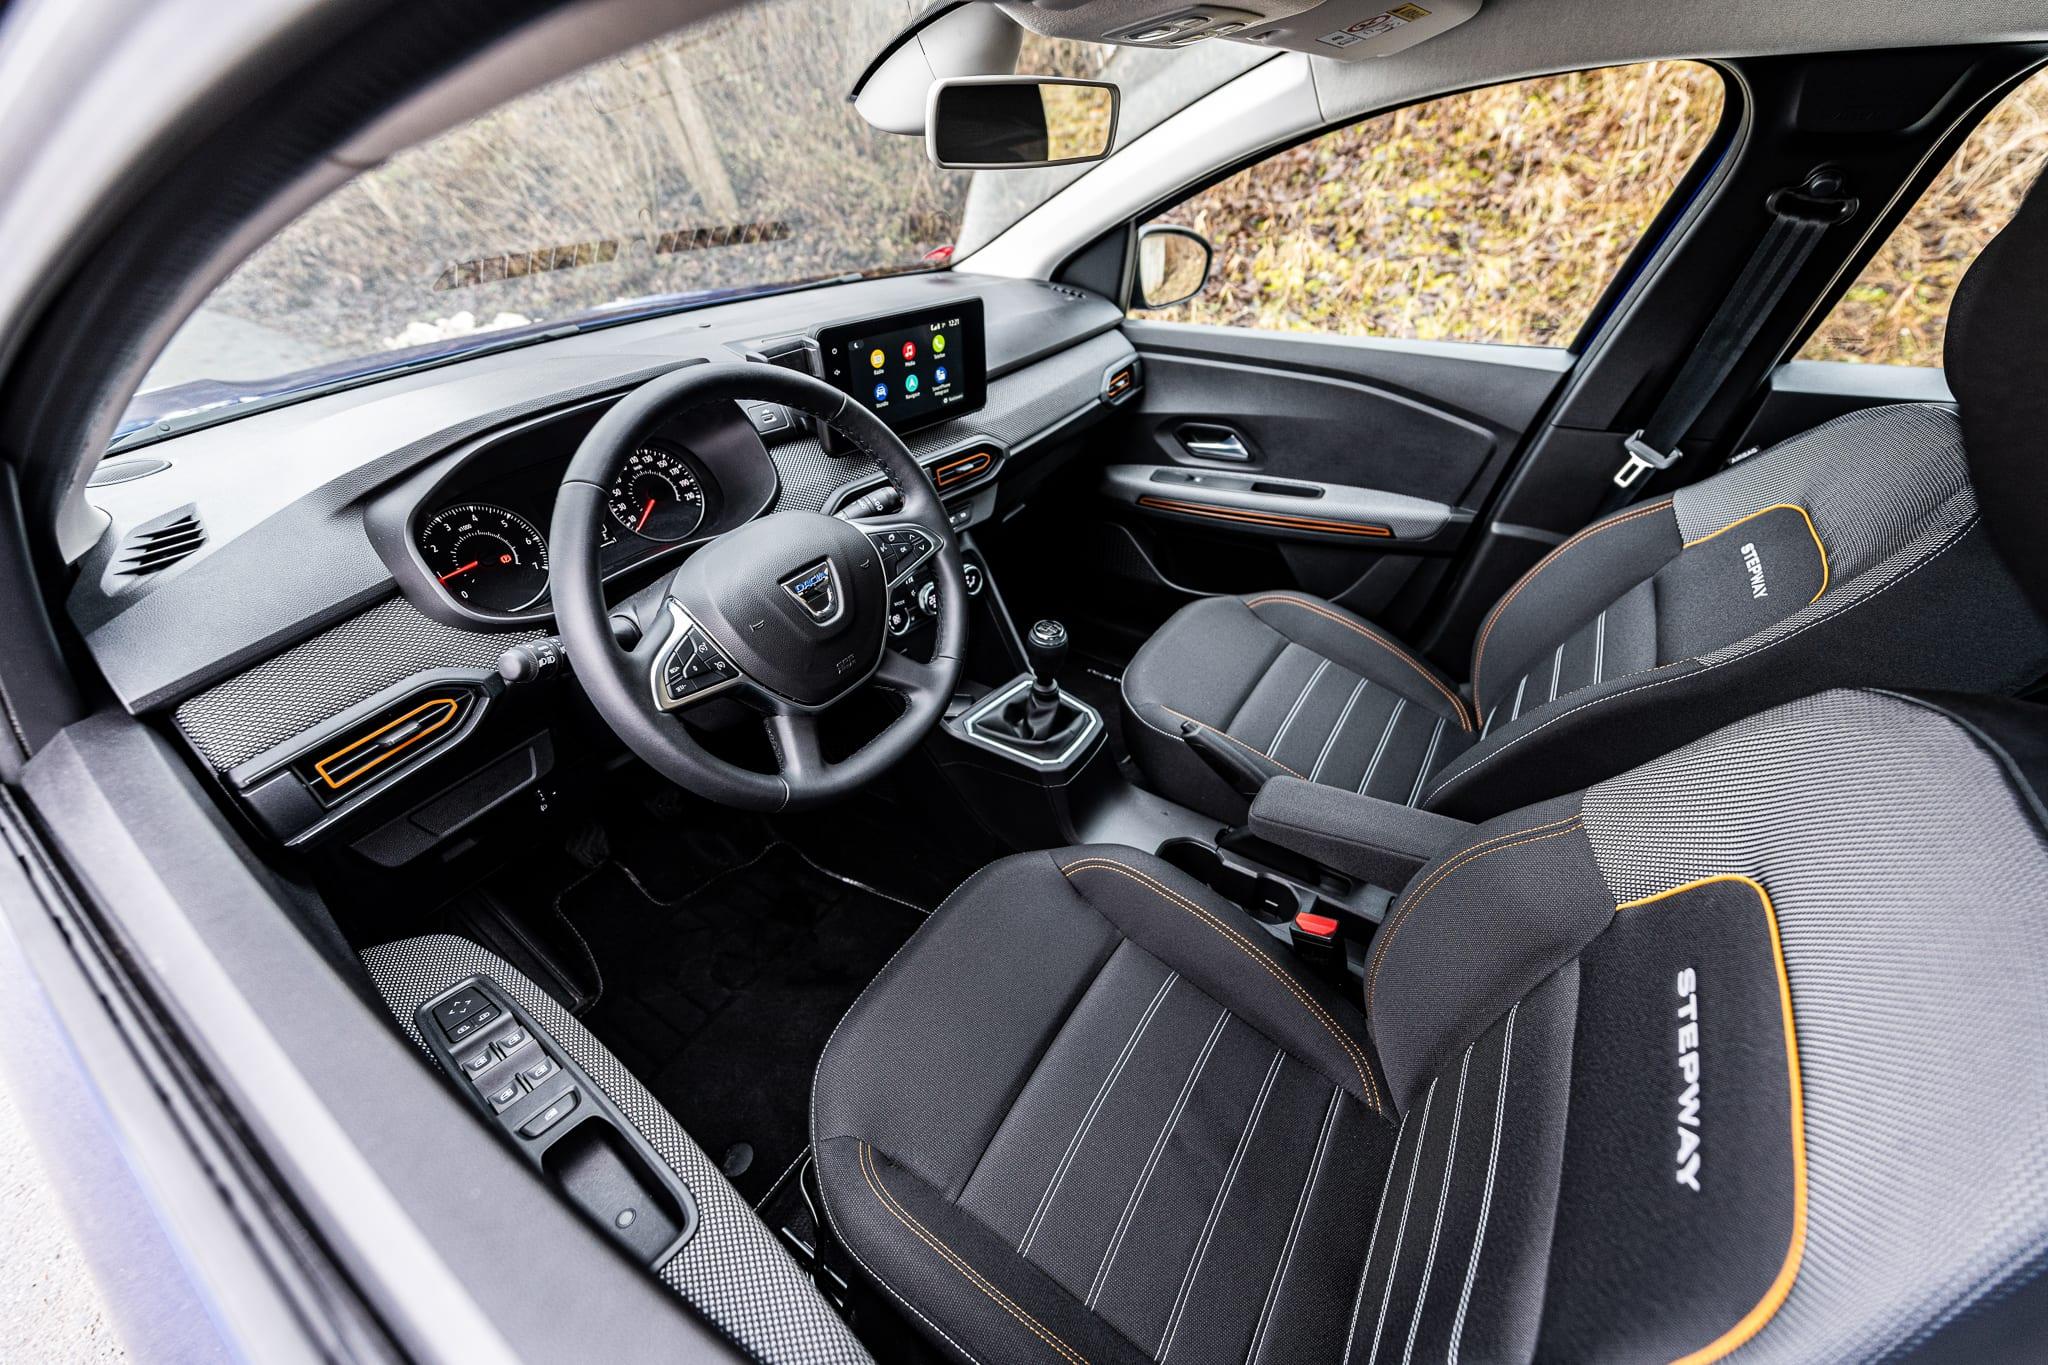 Dacia Sandero interier